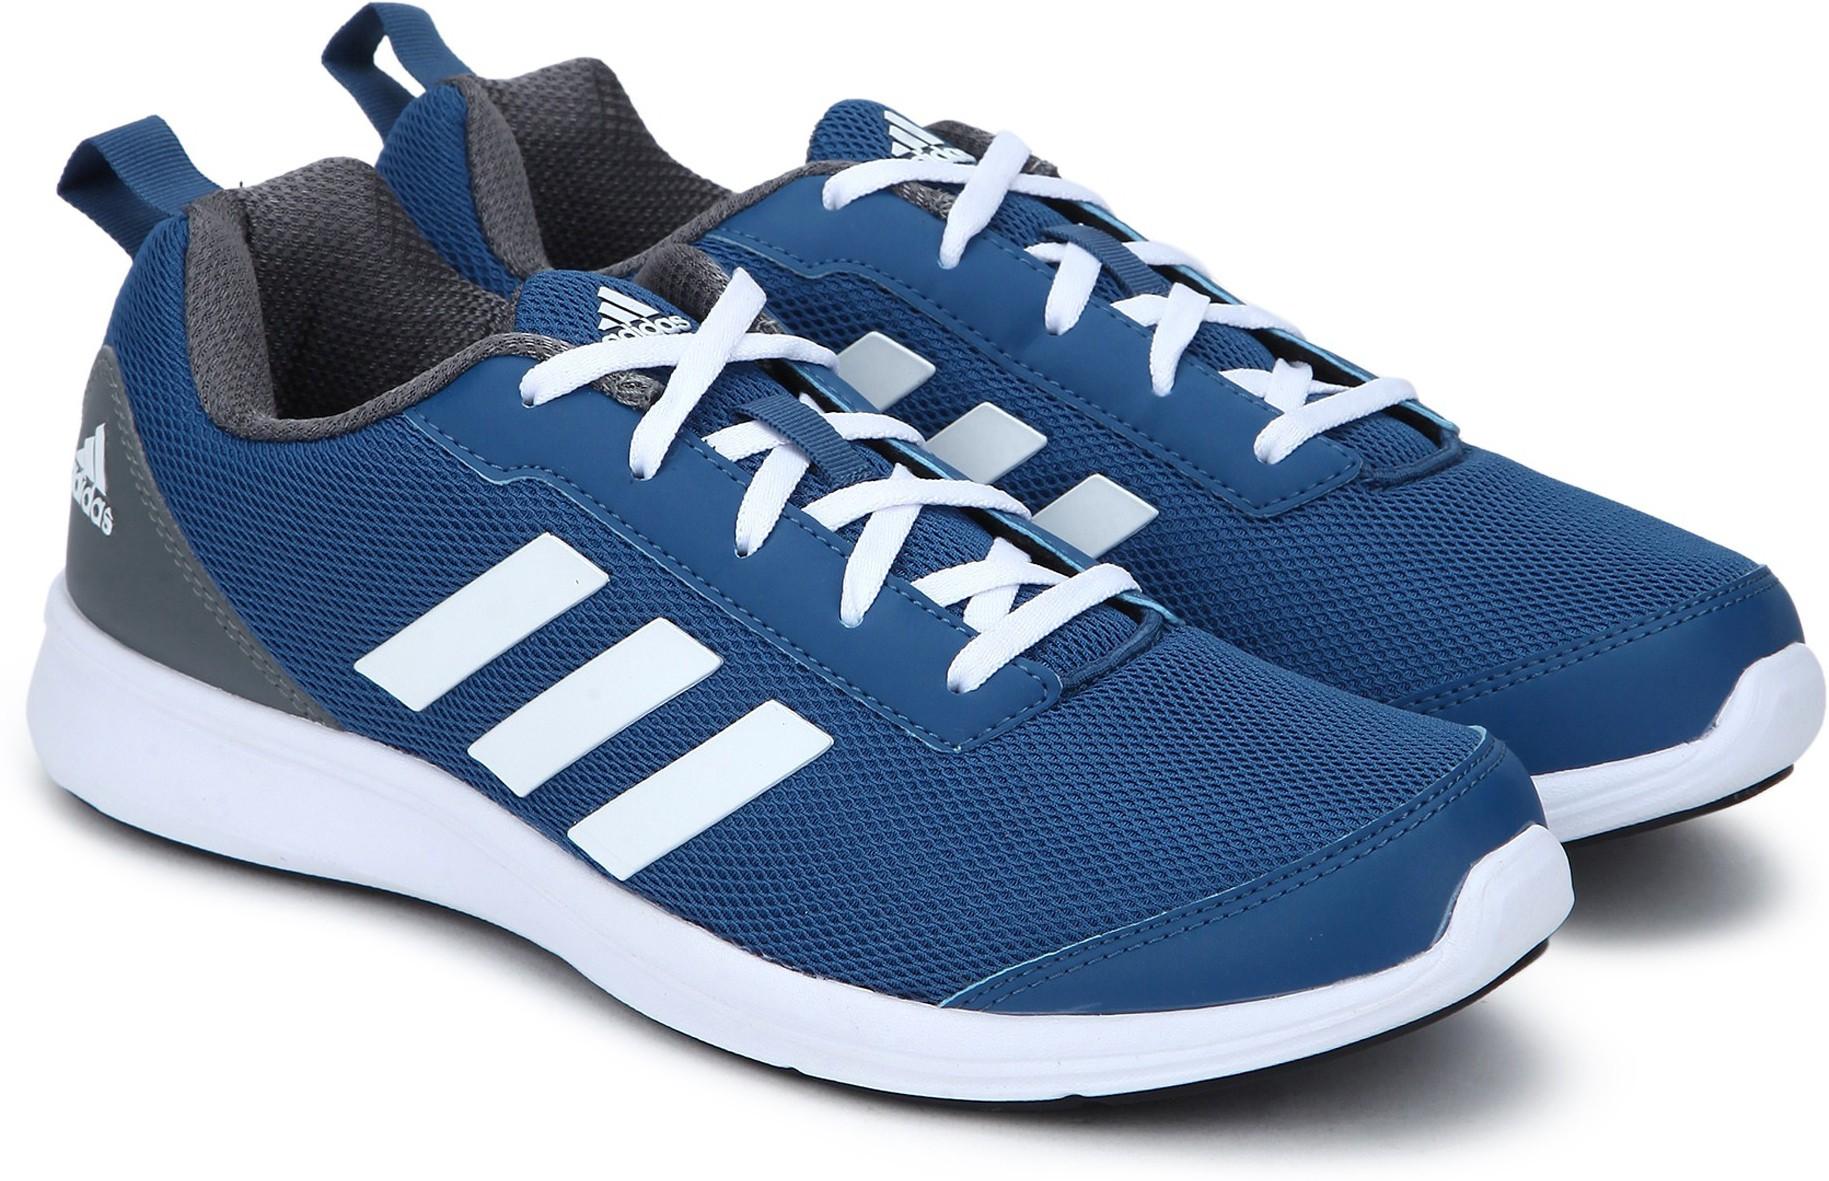 186cce94d Adidas Men s Running Shoes-10 UK India (44 2 3 EU)(CJ0099) - shopingbell